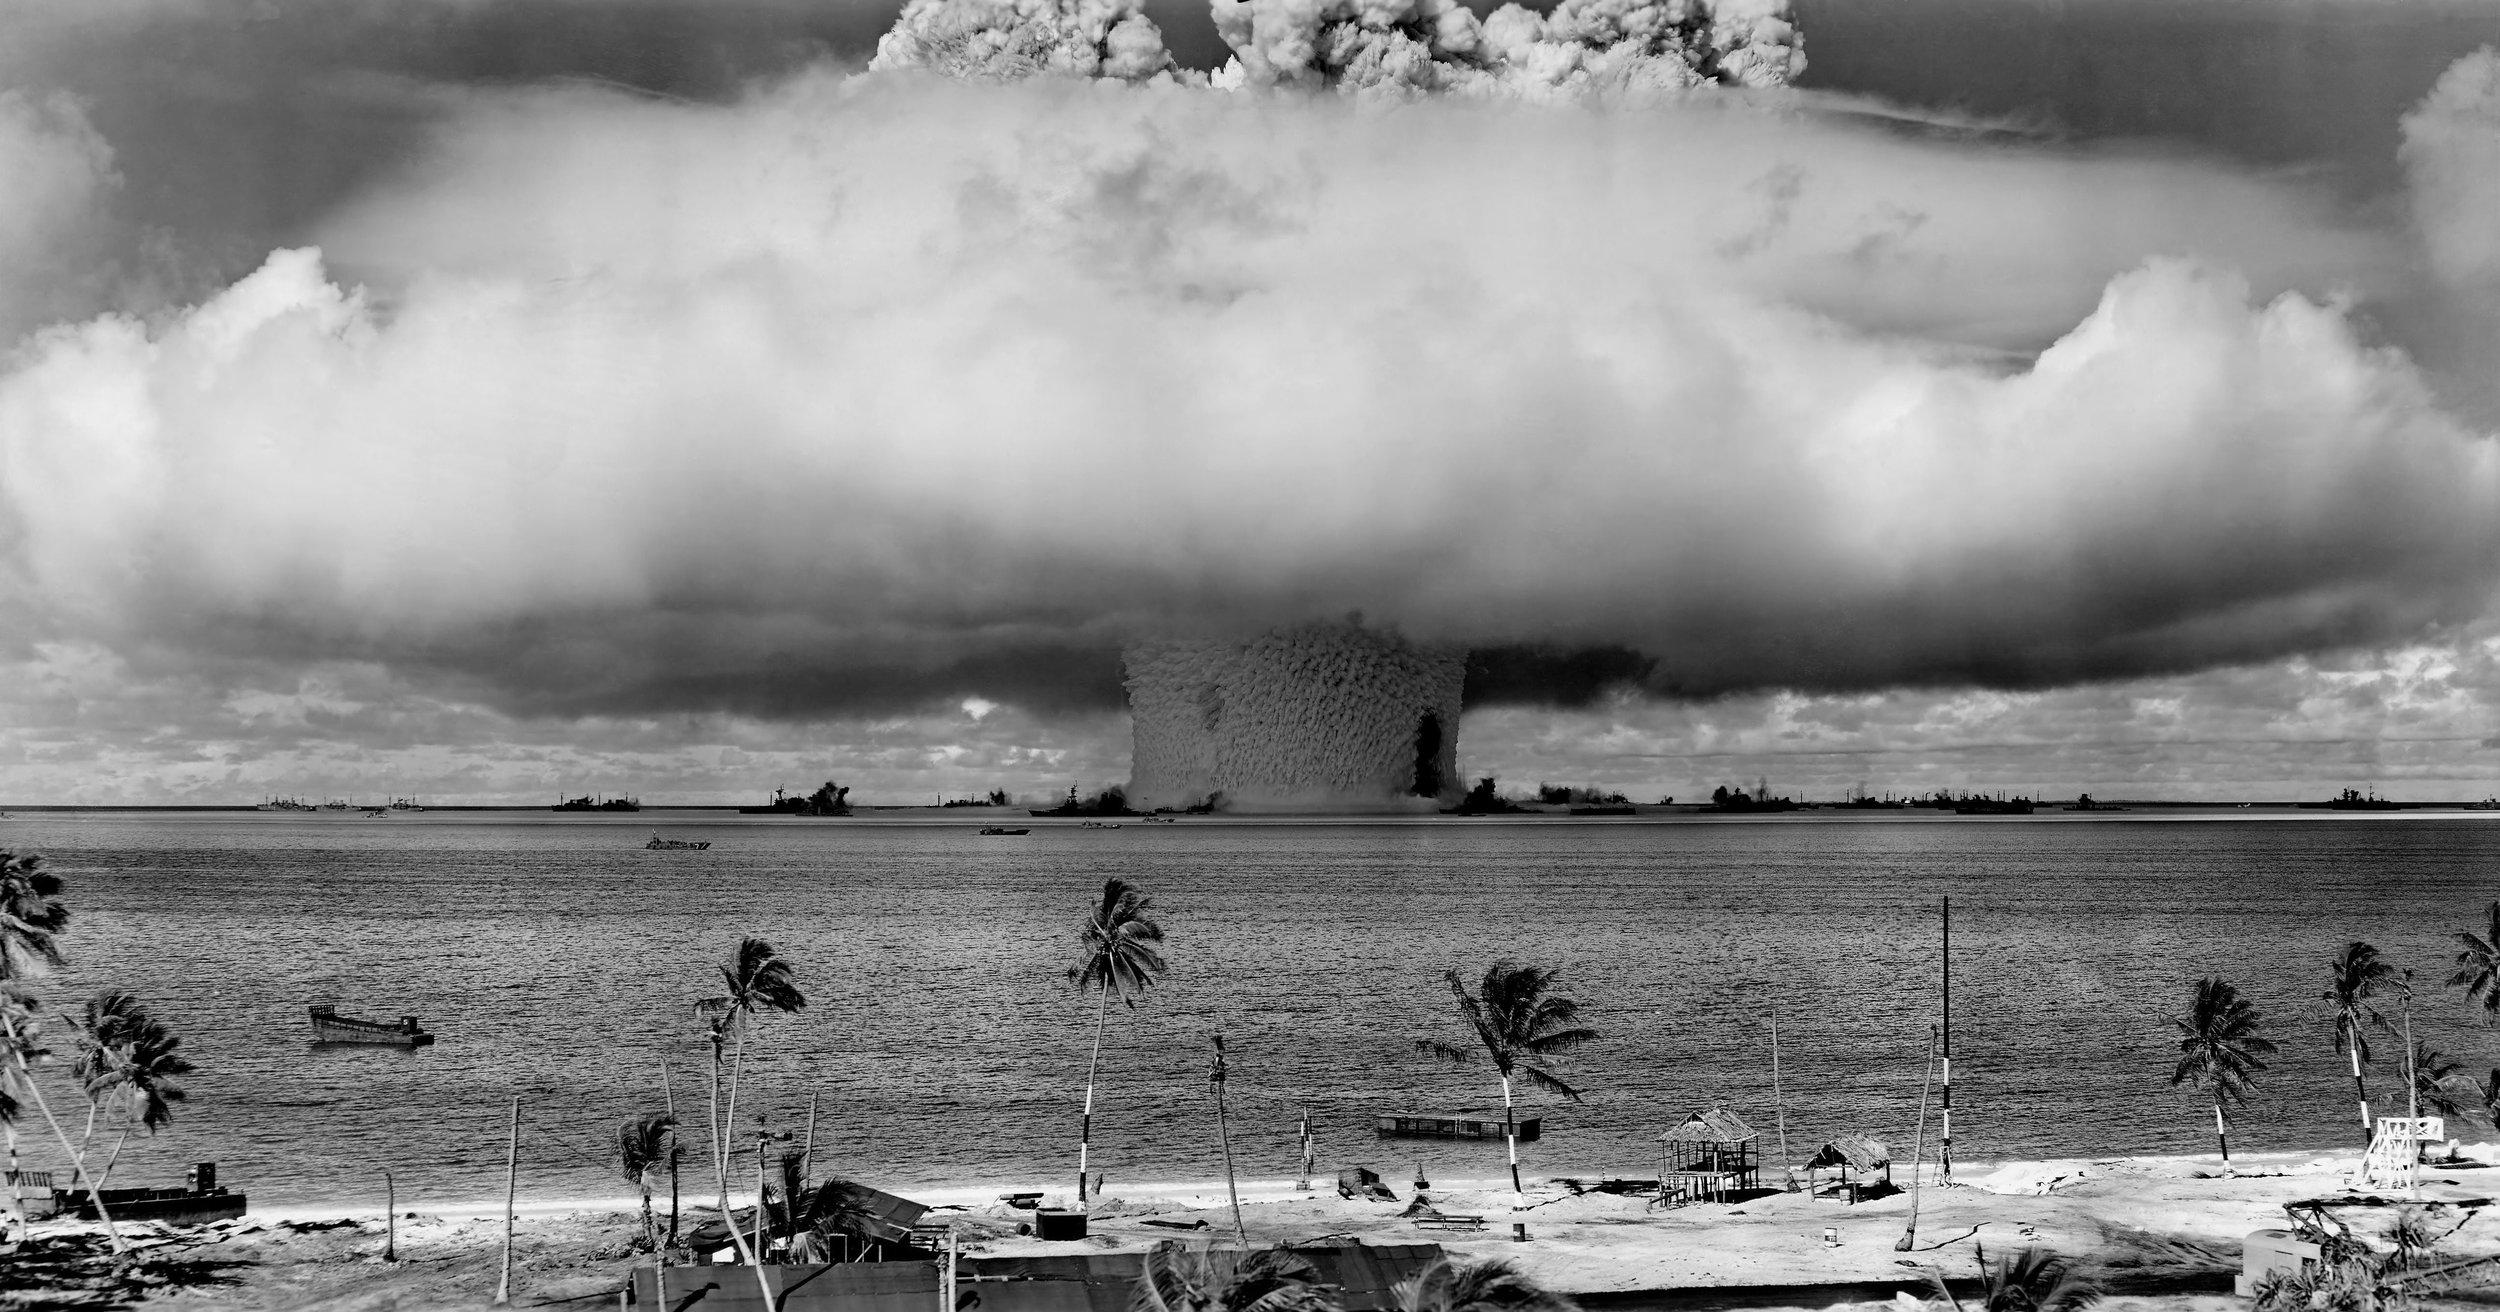 atomic-bomb-beach-black-and-white-73909.jpg